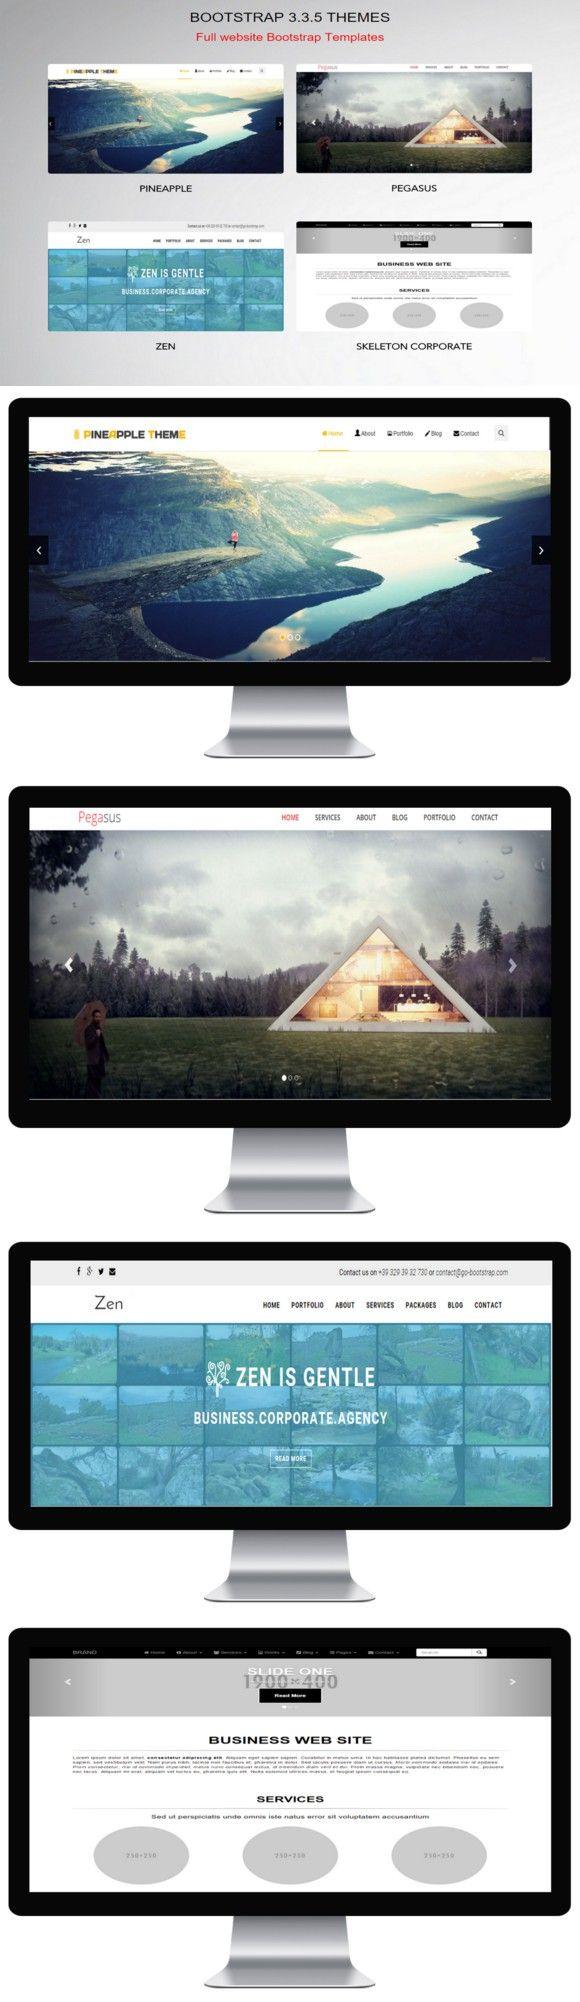 Bootstrap 3.3.5 Themes Theme, Jquery, Design skills